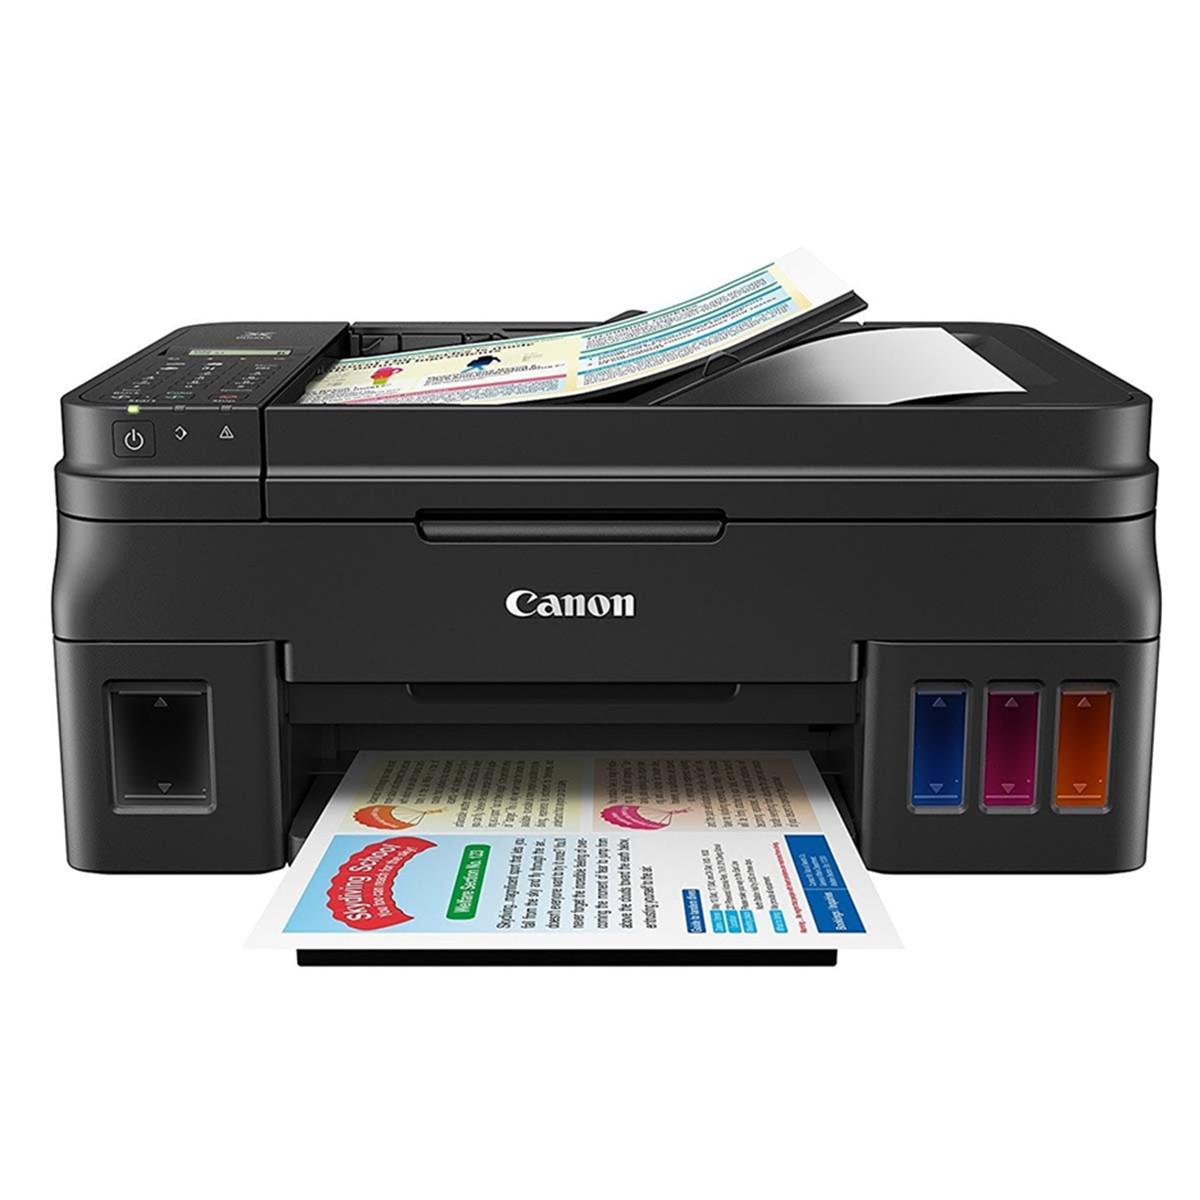 Impressora Canon Maxx Tinta G4100 | Multifuncional Tanque de Tinta com Wireless e ADF